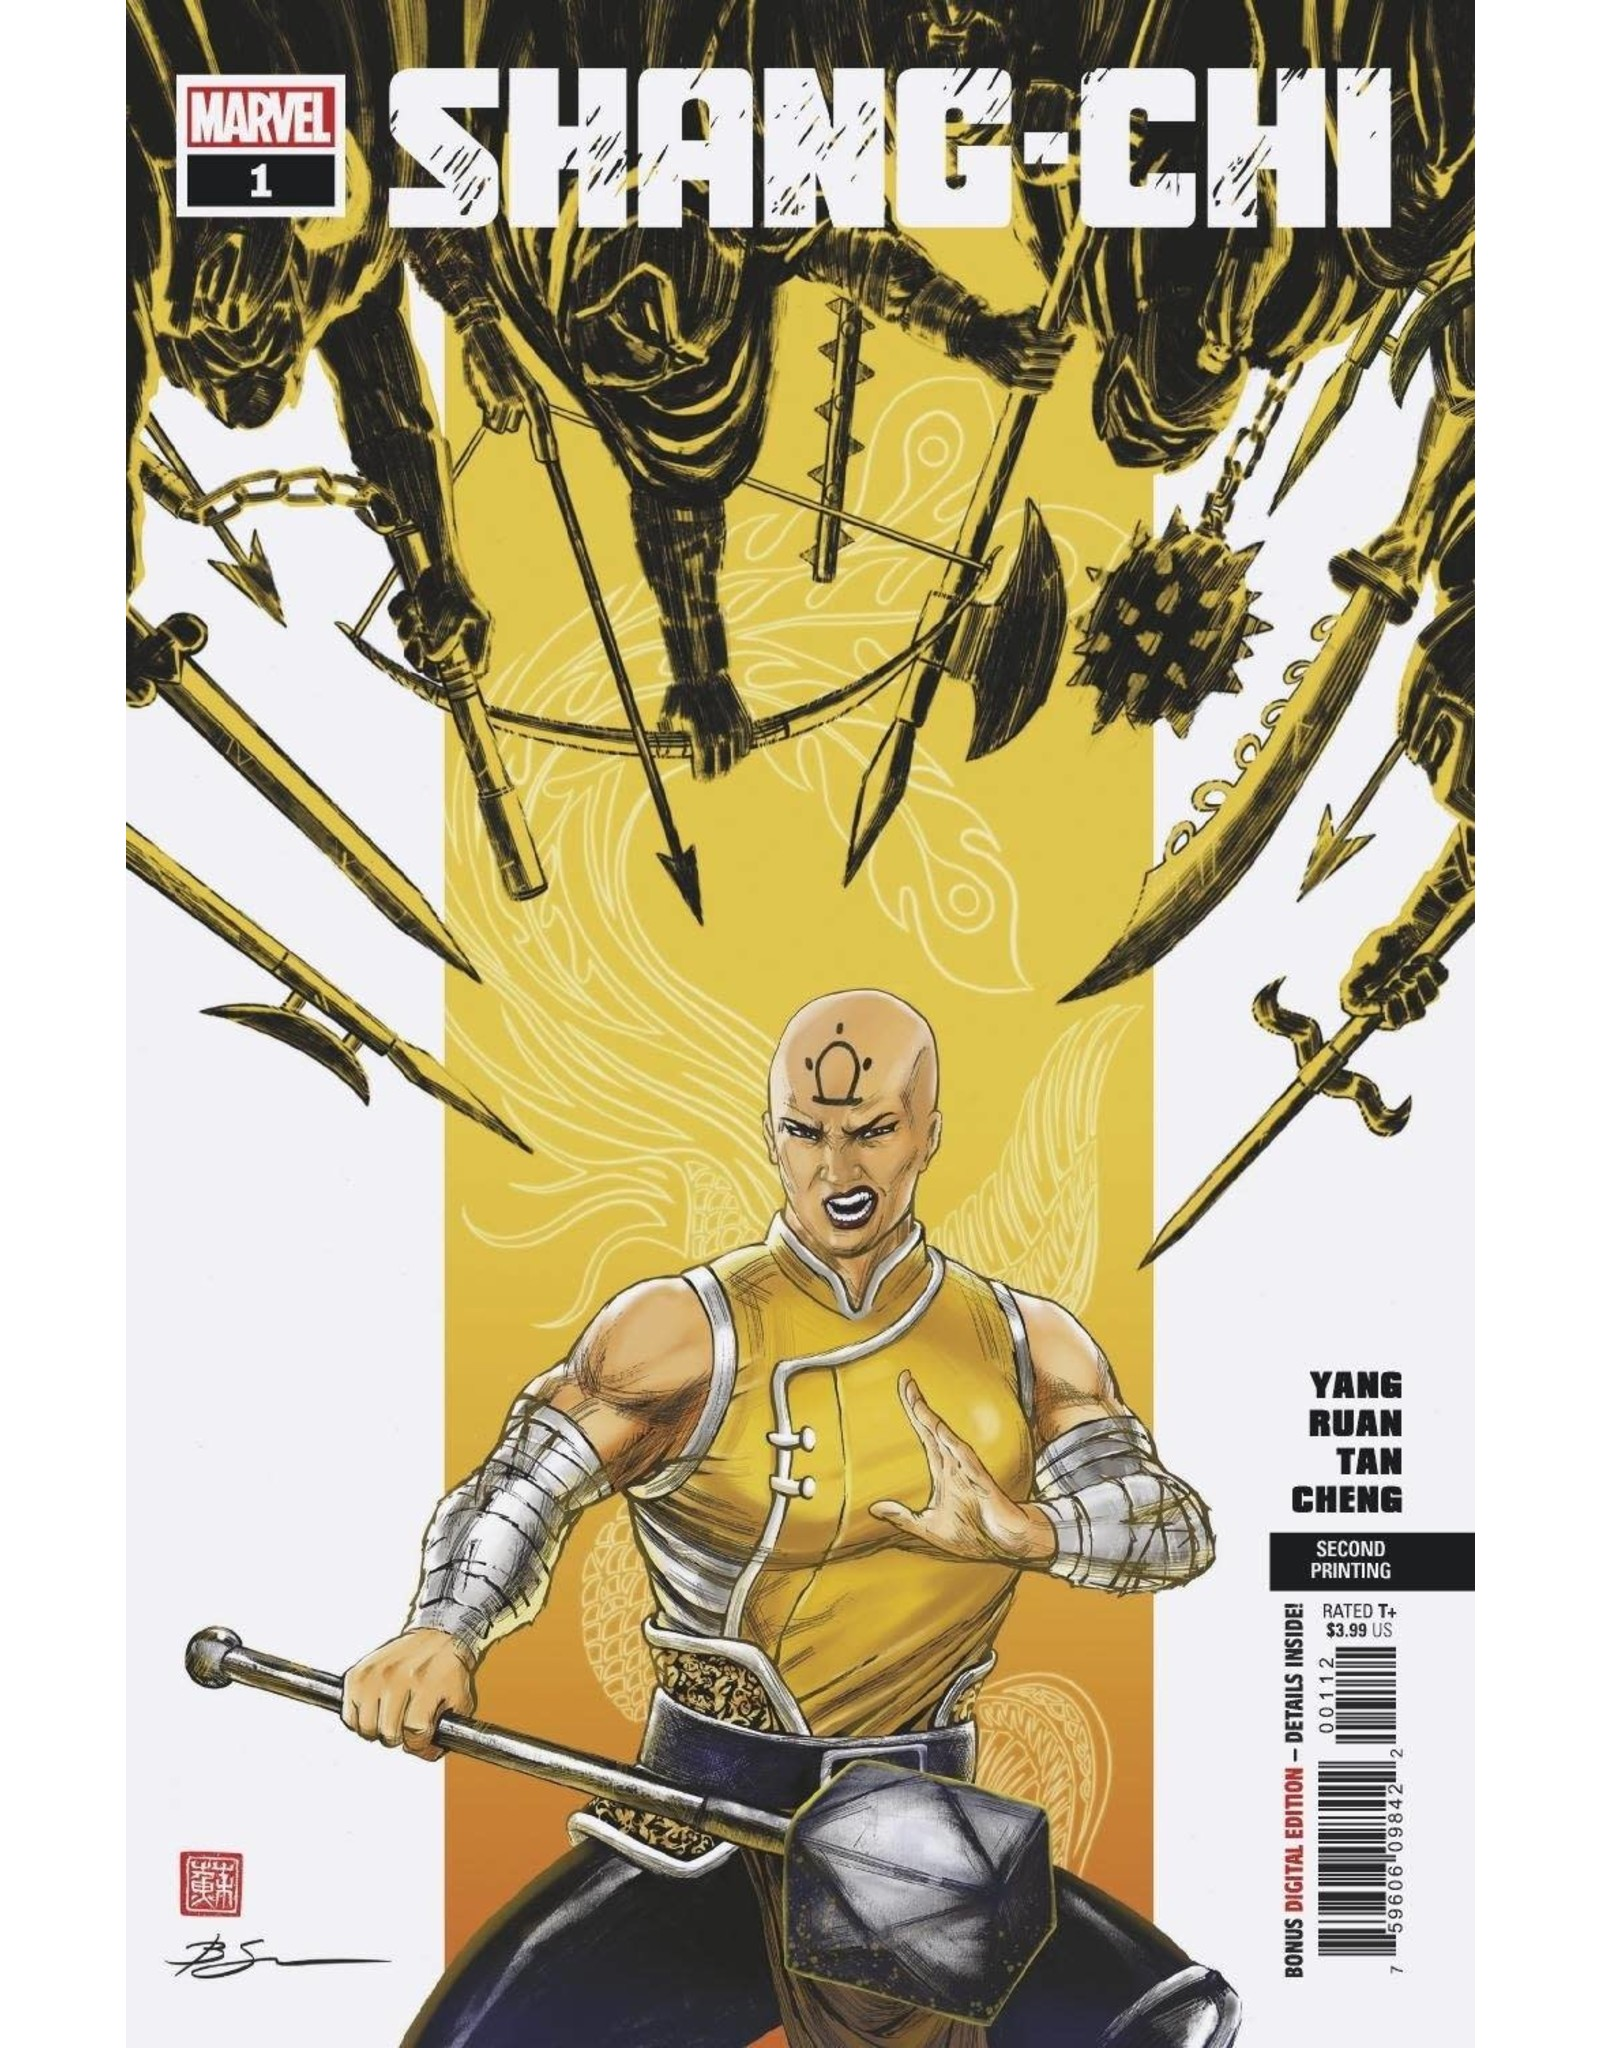 Marvel Comics SHANG-CHI #1 (OF 5) 2ND PTG SU VAR